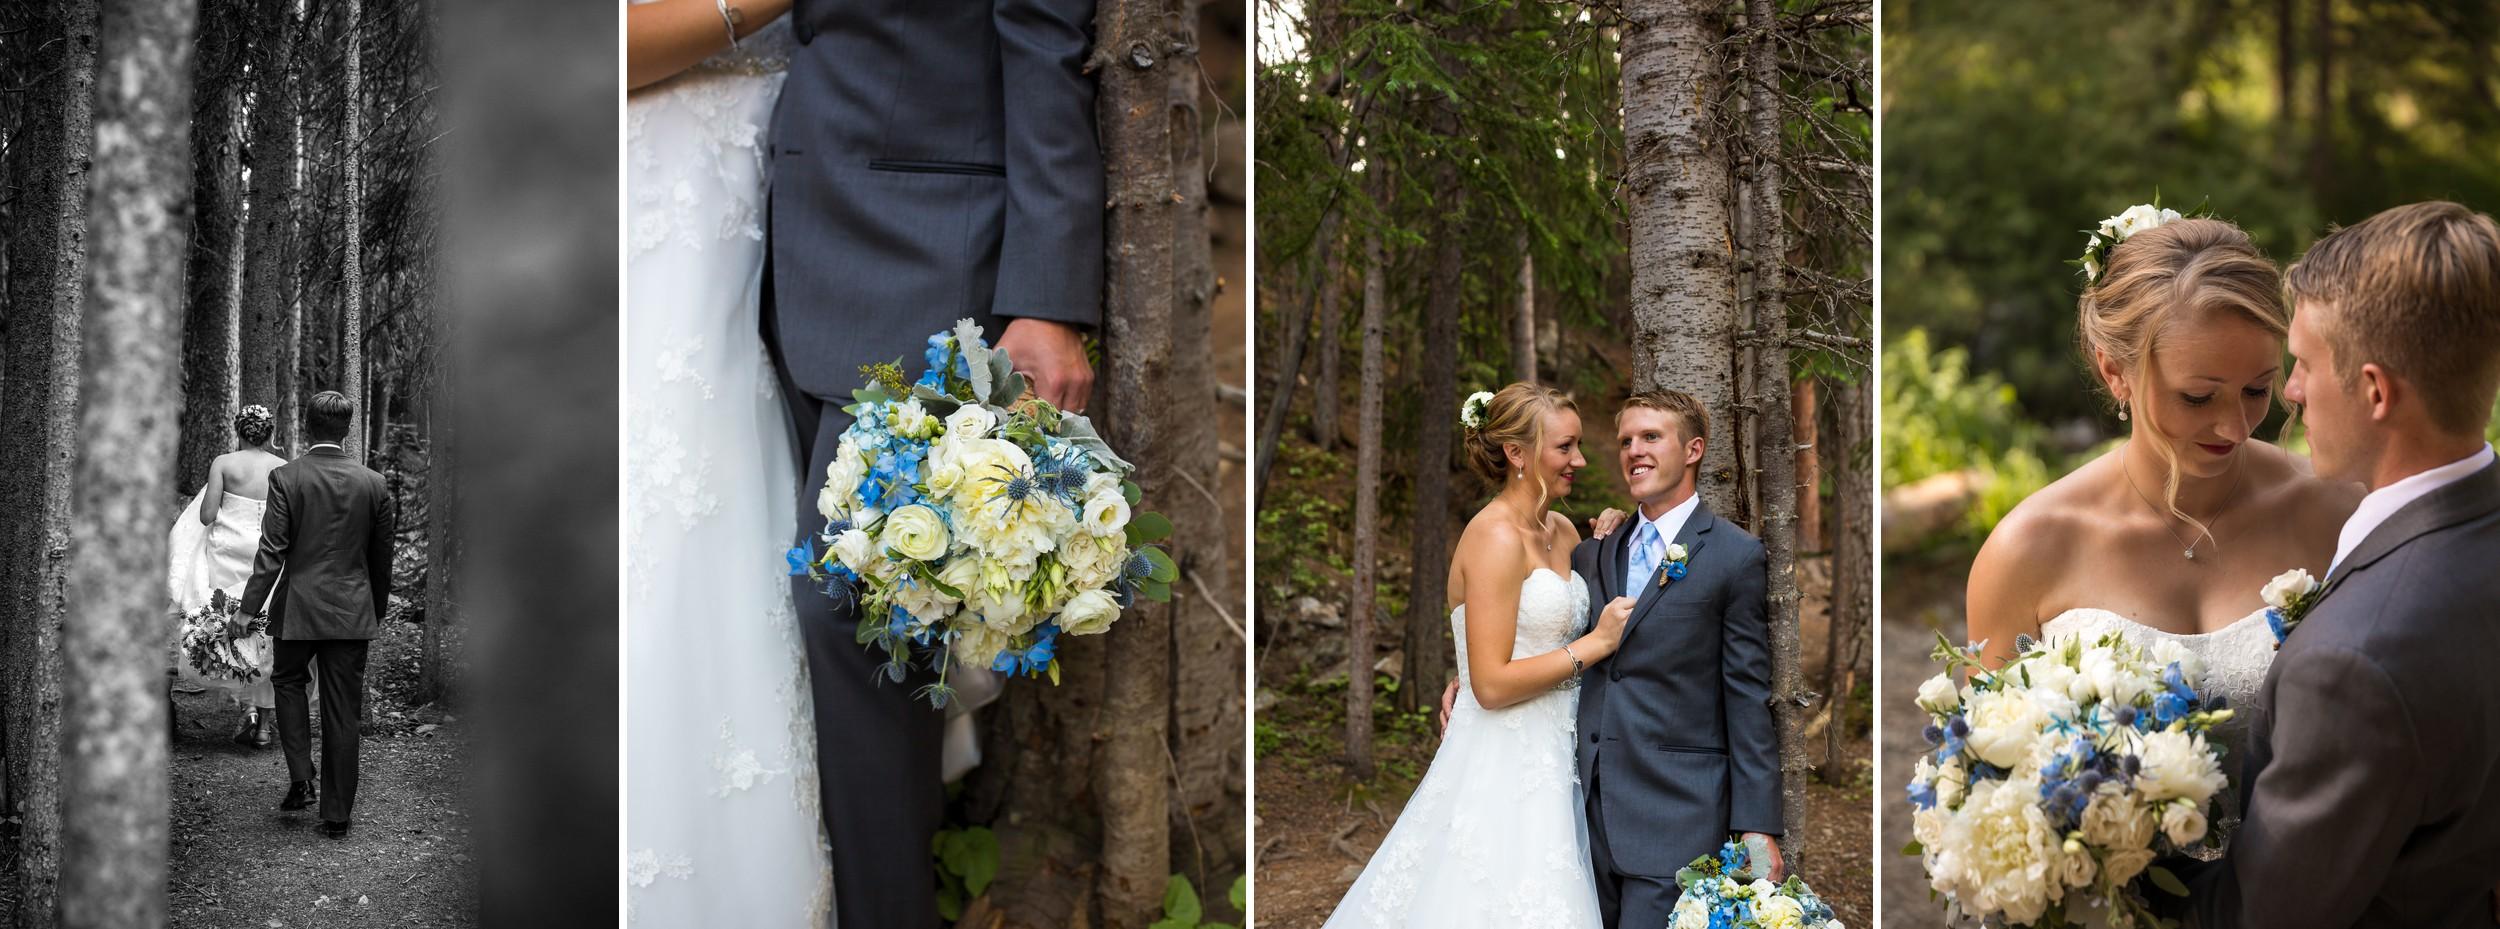 Breckenridge_Wedding_Photographer_Kristopher_Lindsay_ 16.jpg